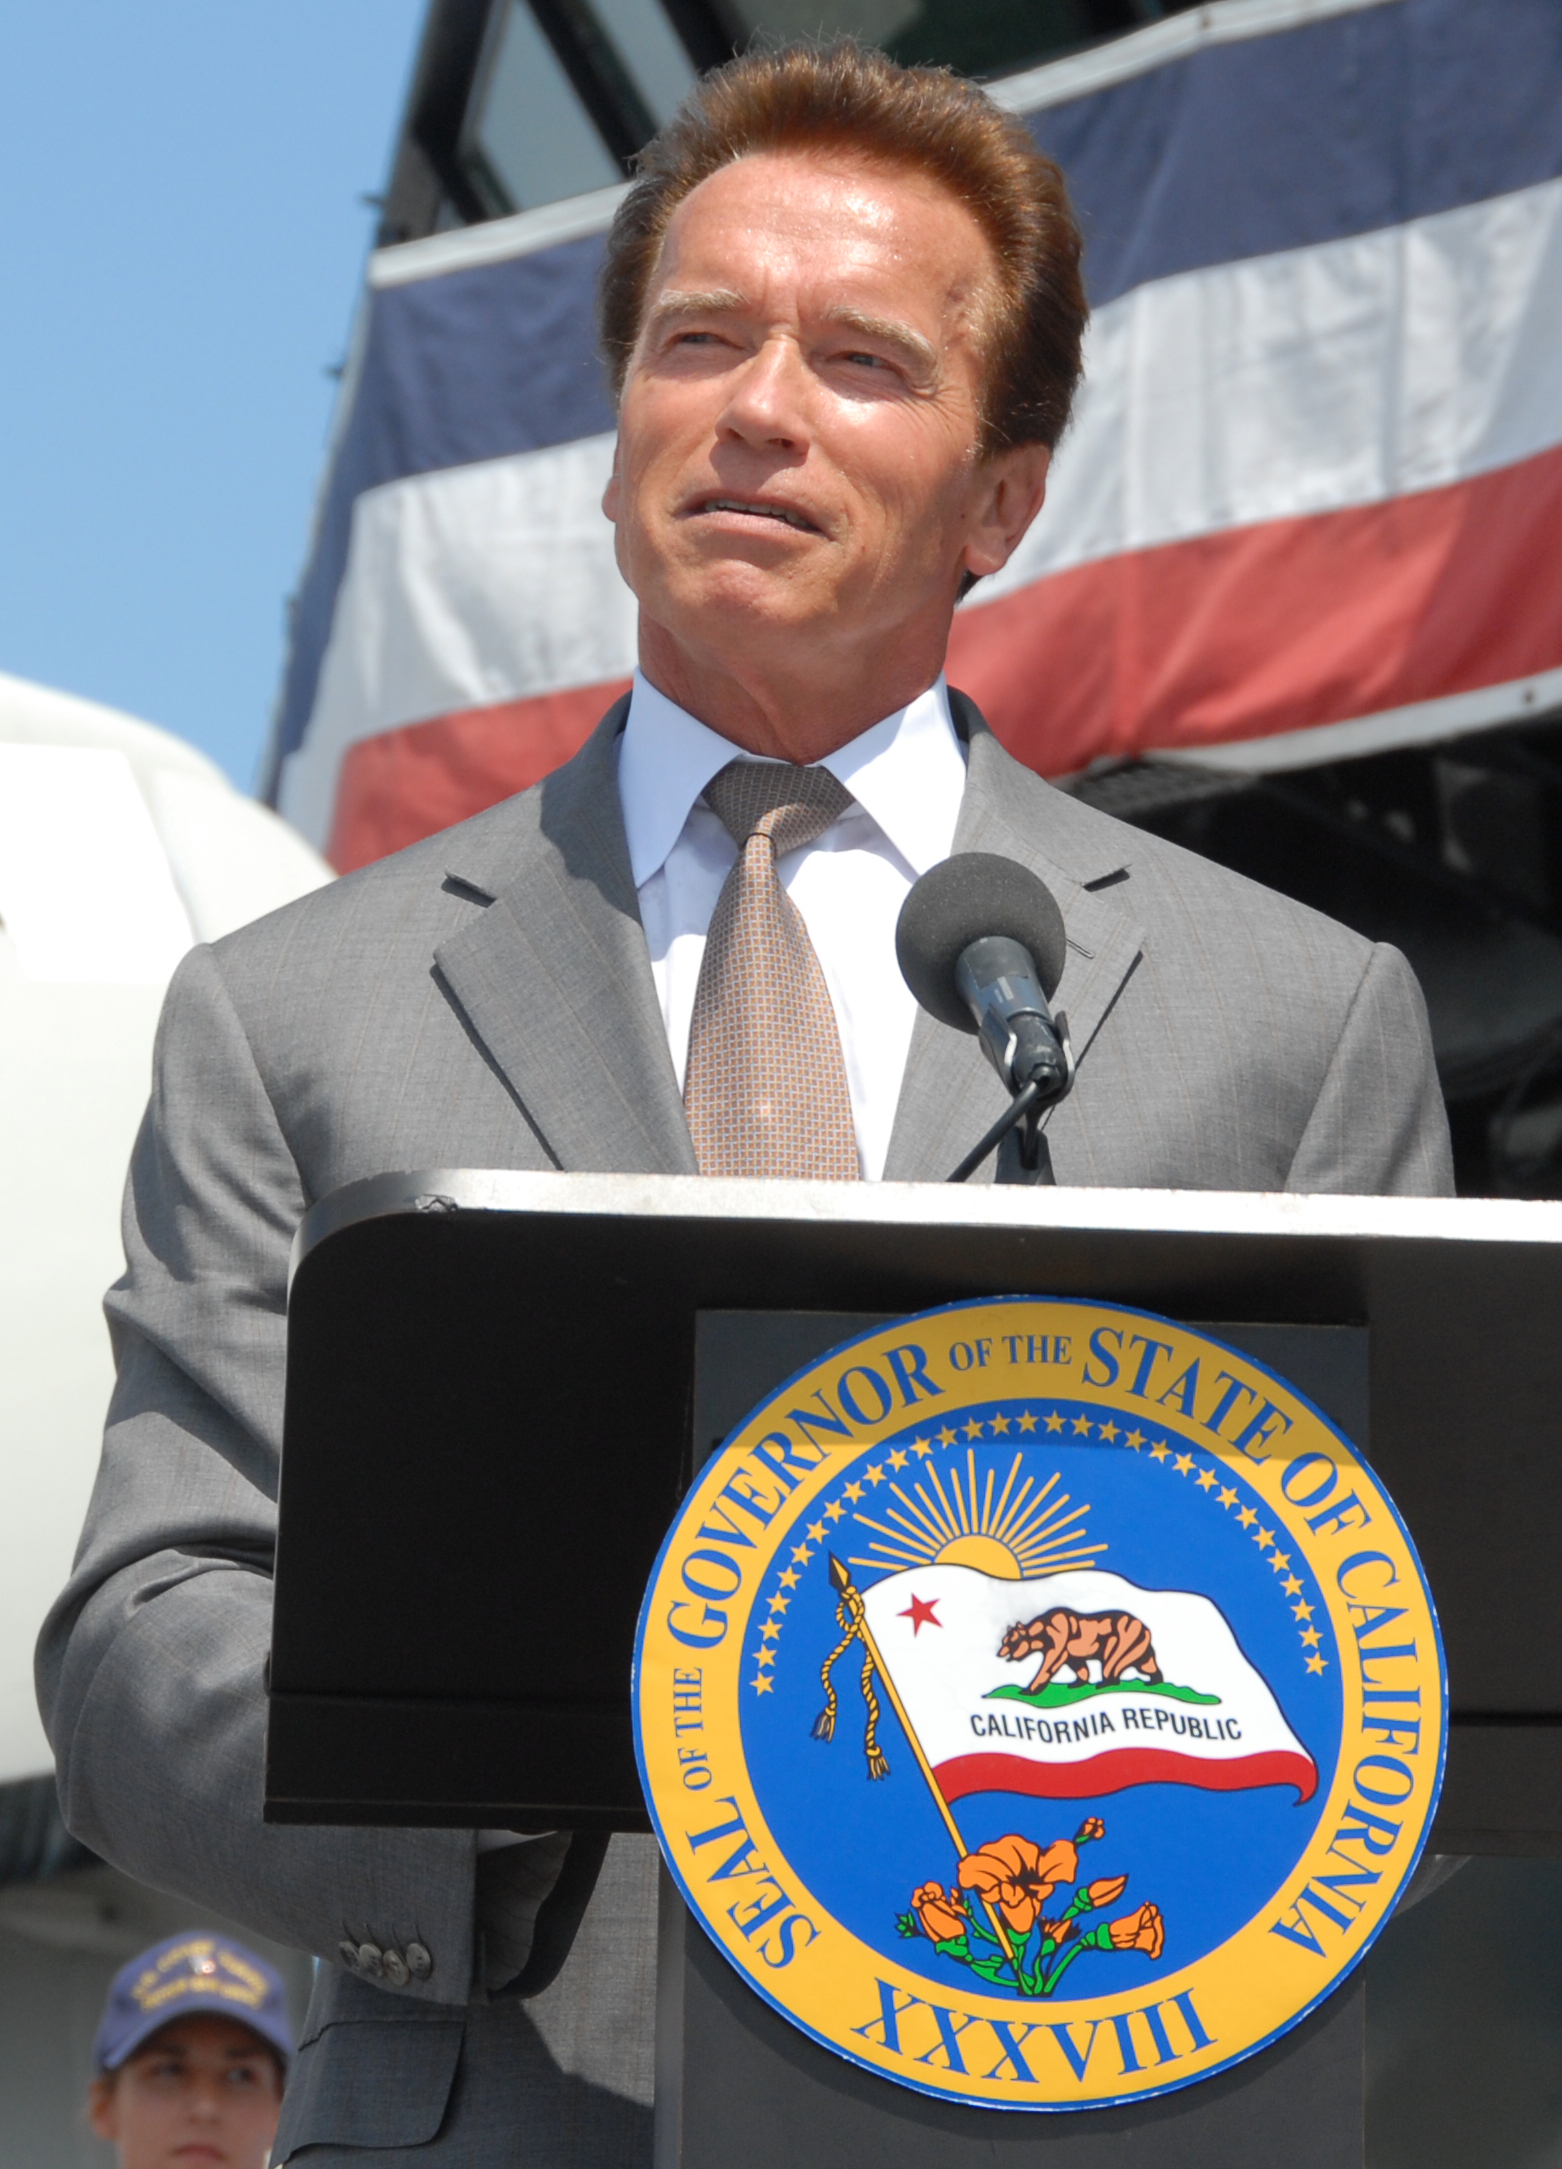 schwarzenegger 2010 - Arnold Schwarzenegger Lebenslauf